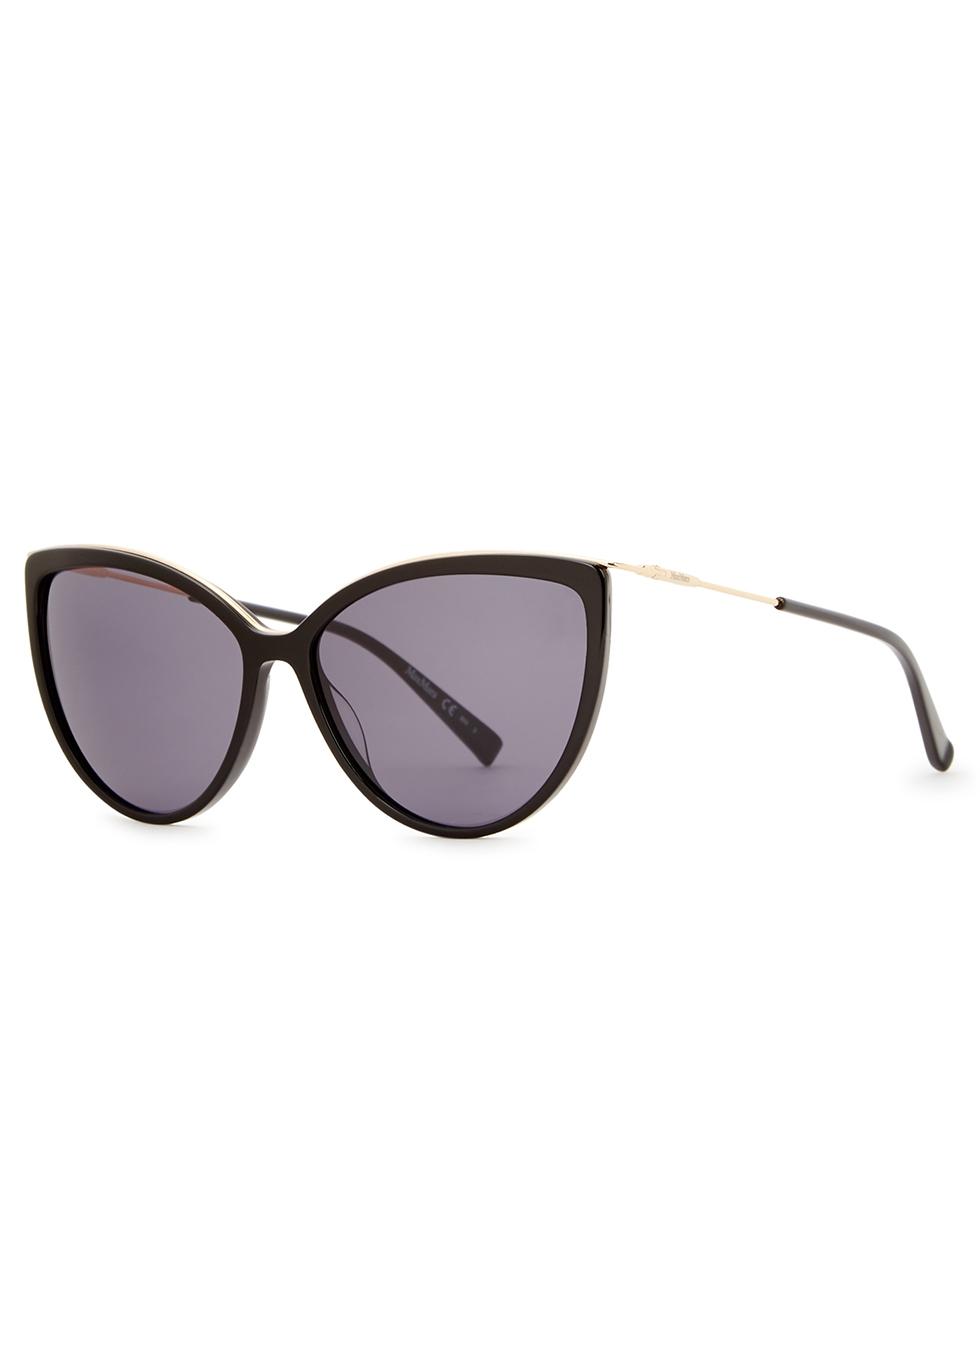 ed7a41cd9dd Women s Designer Cat-Eye Sunglasses - Harvey Nichols